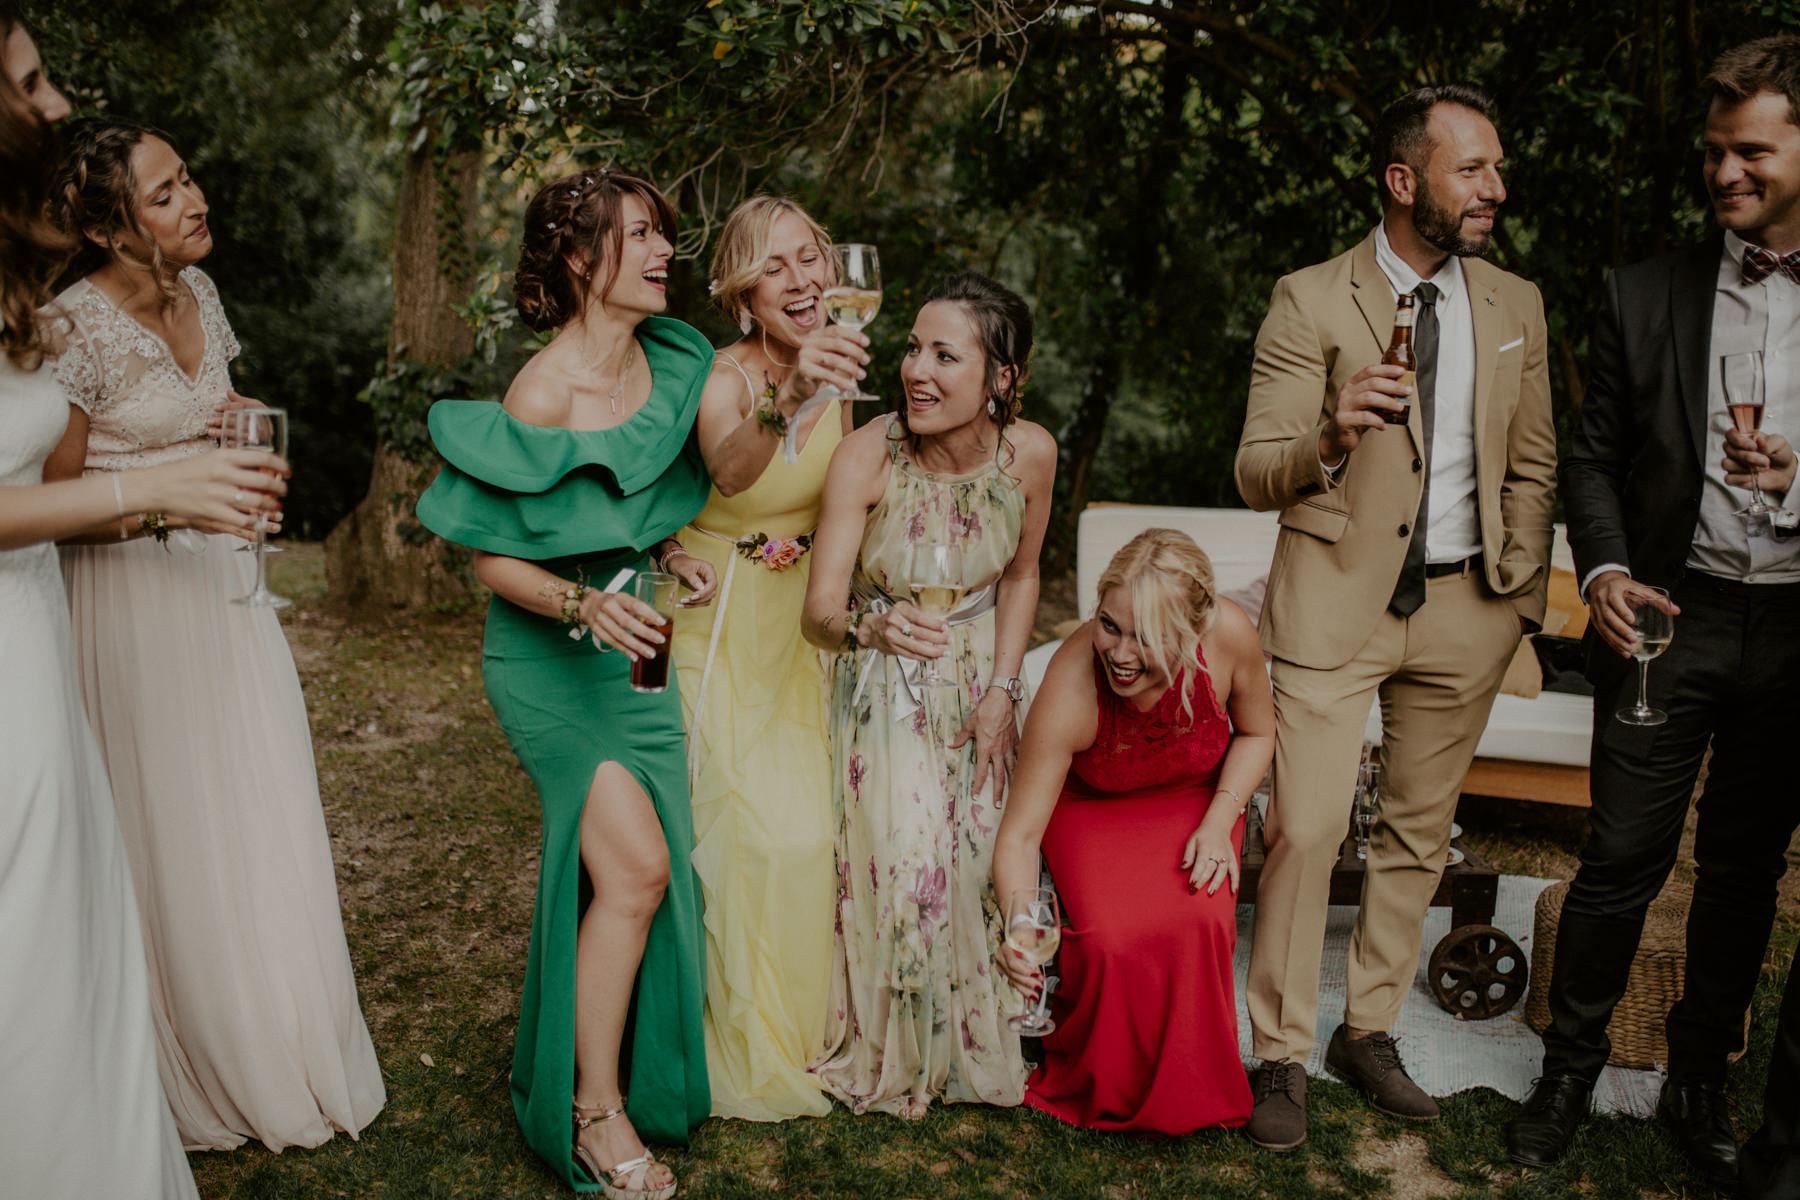 alt_thenortherngirlphotography_couples_weddingphotographer_photographer_wedding_boda_fotografodebodas_fotografobodasbarcelona_bodaindie_bodasconestilo_bodaensantperedeclara_jennifermiguel-618.jpg